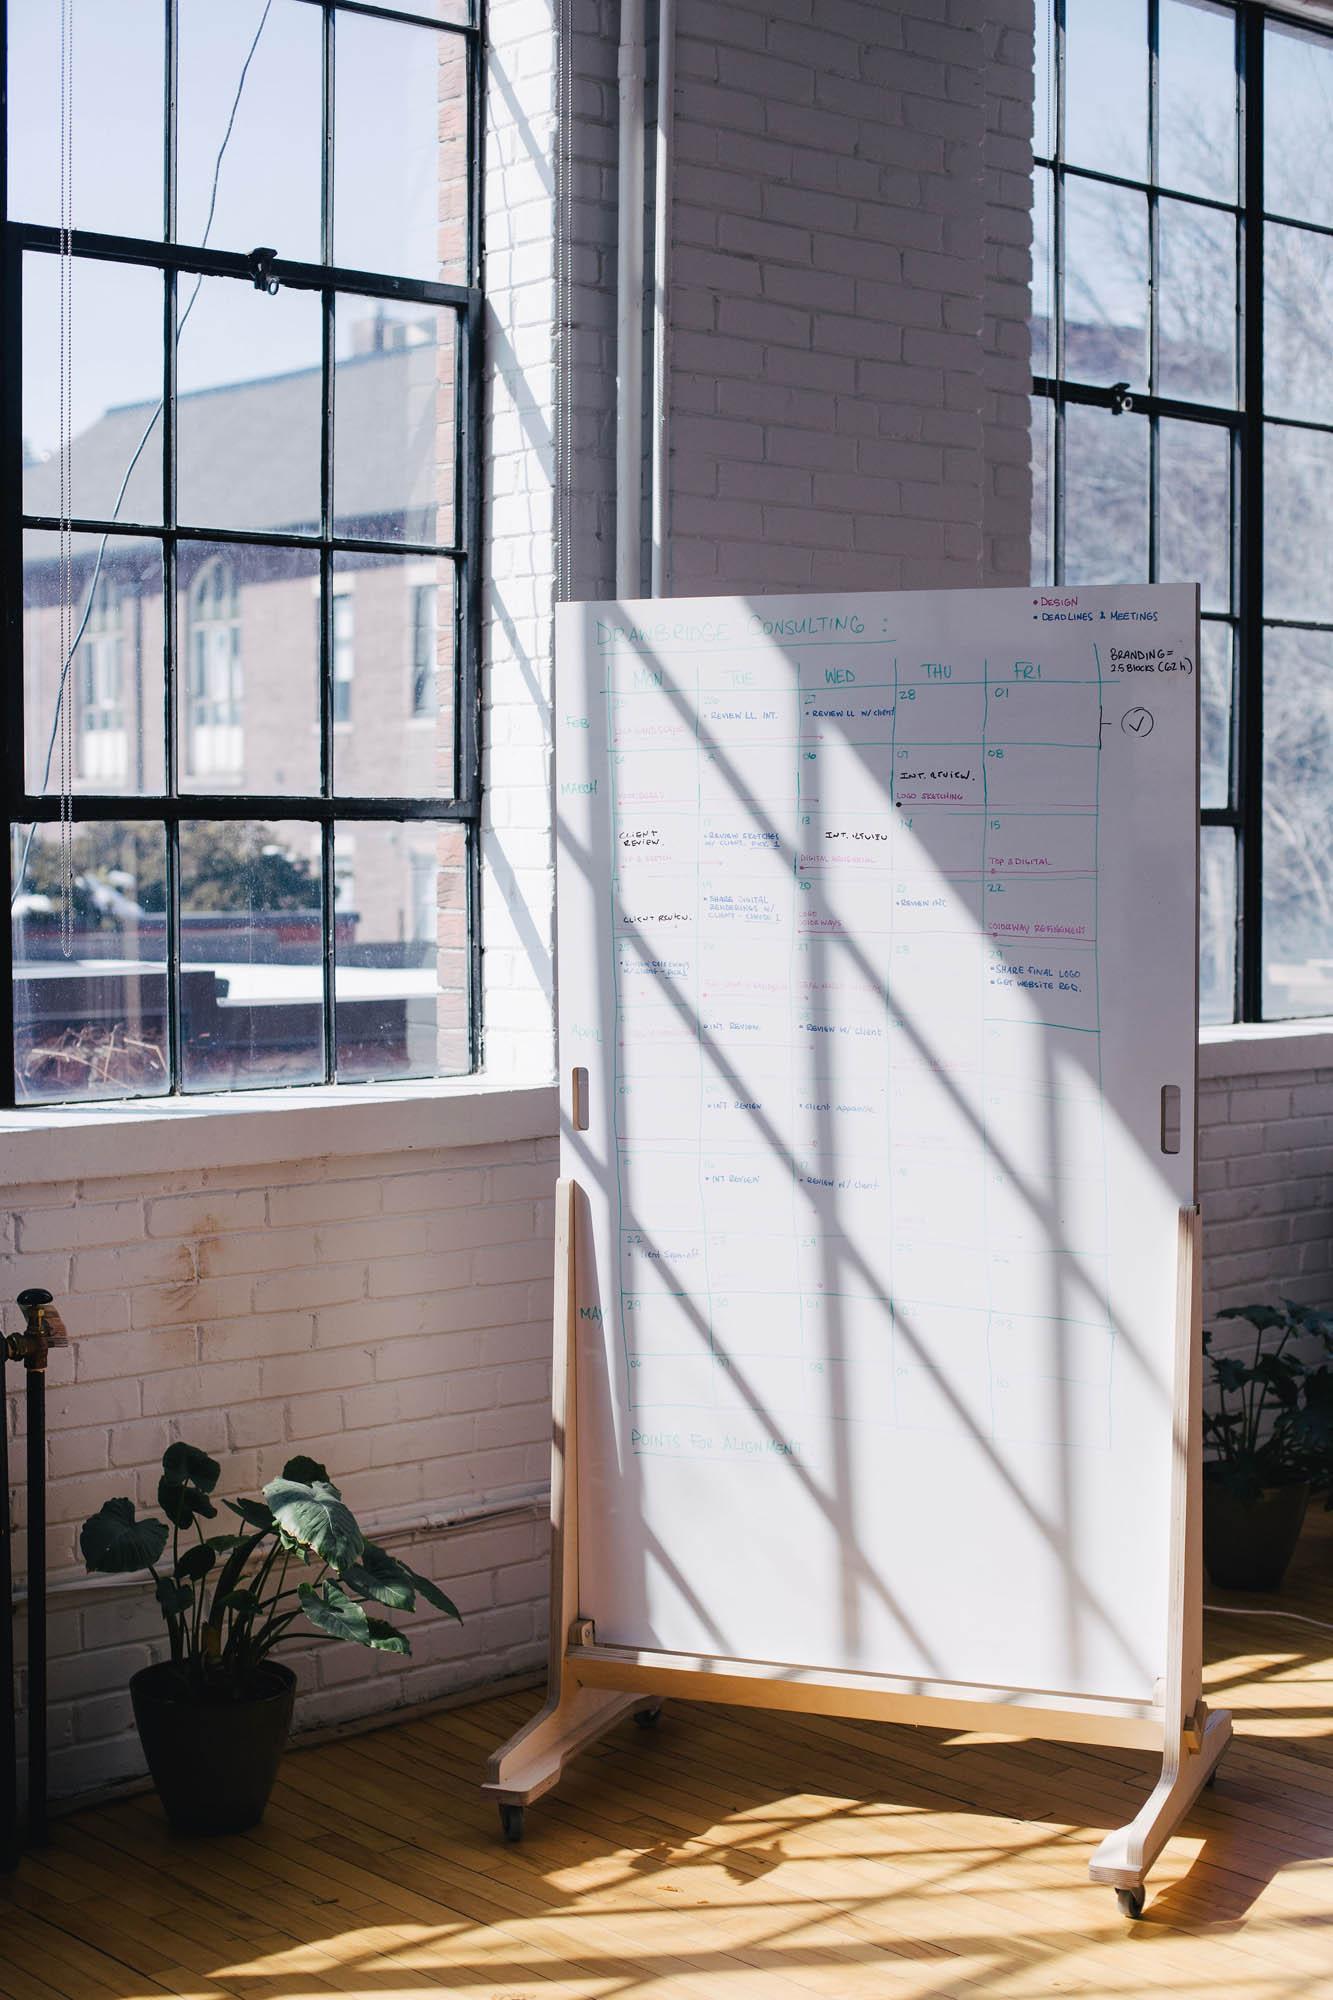 Aciron case study whiteboard in sunlight